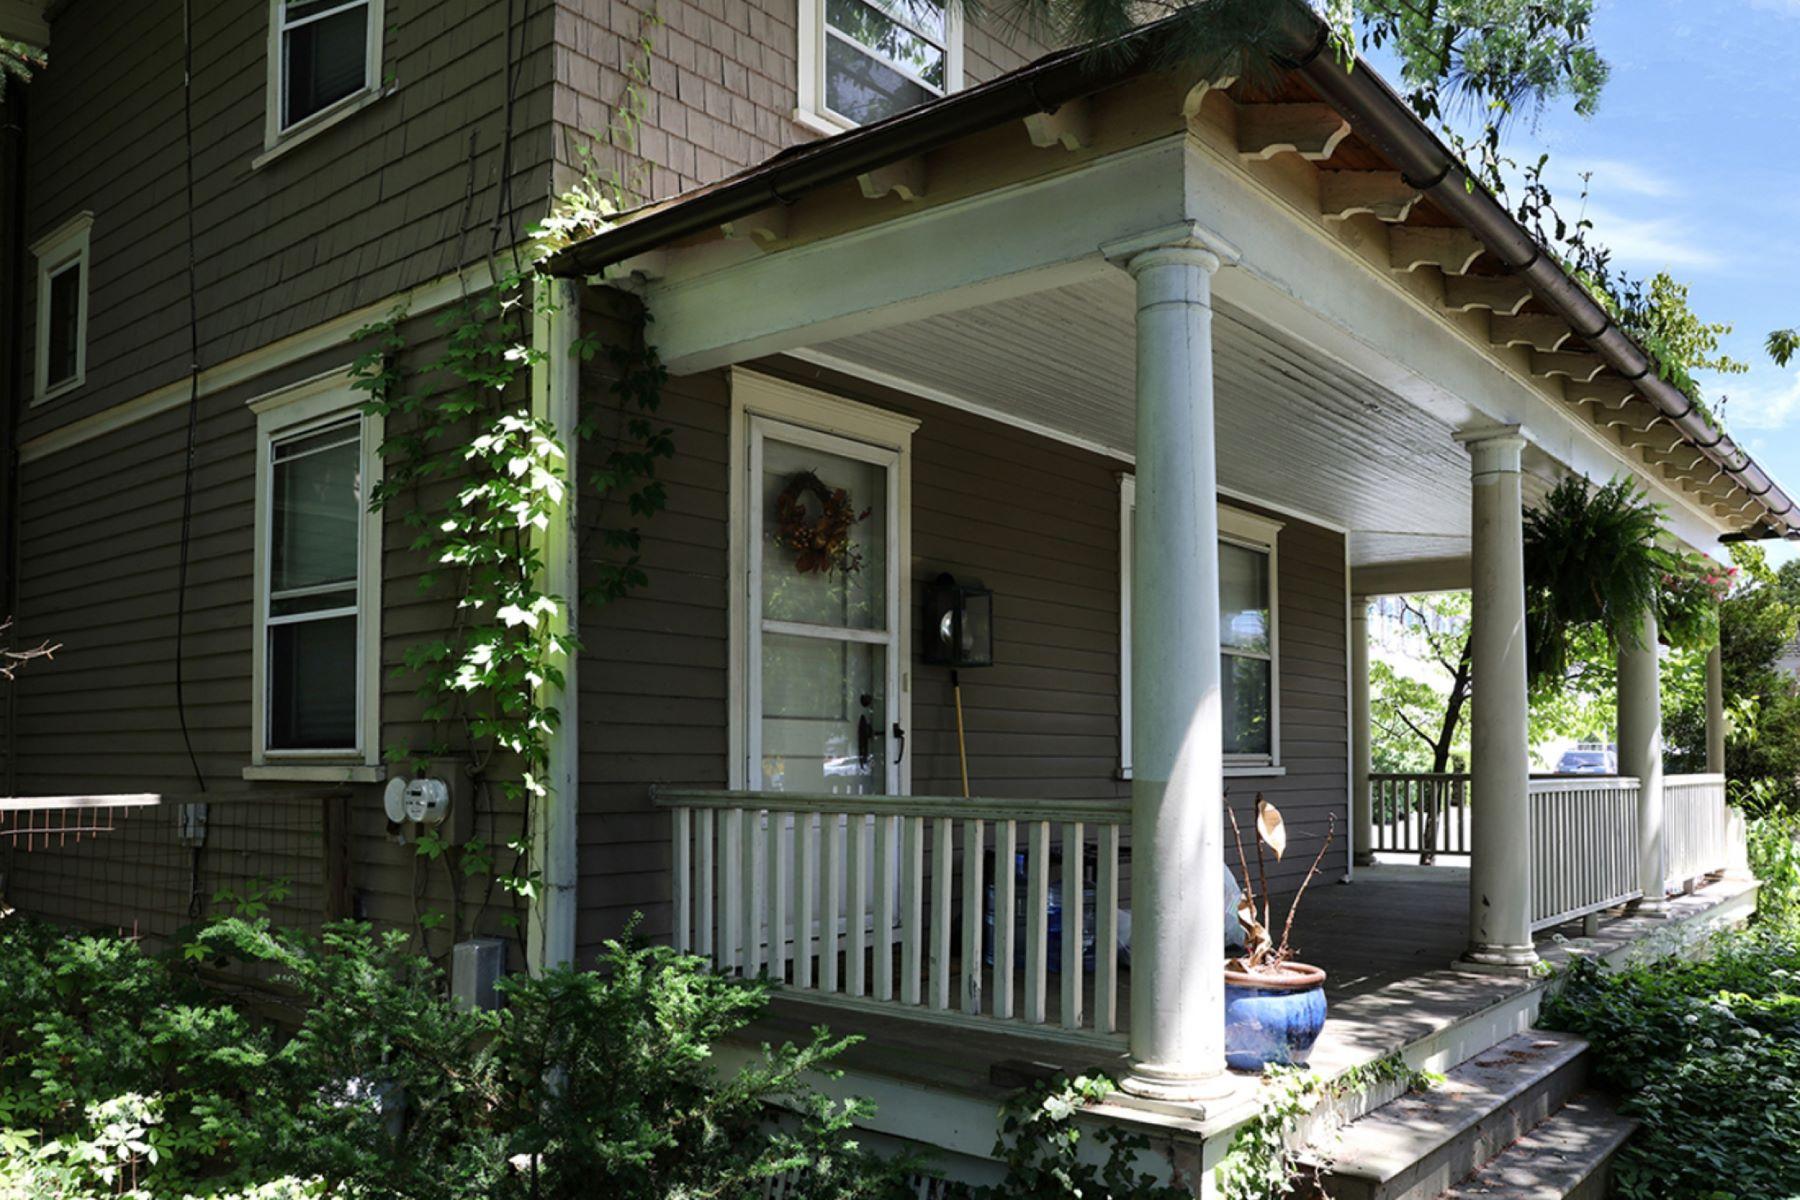 Additional photo for property listing at Lahaska, PA 5752 ROUTE 202, Lahaska, Pennsylvanie 18931 États-Unis